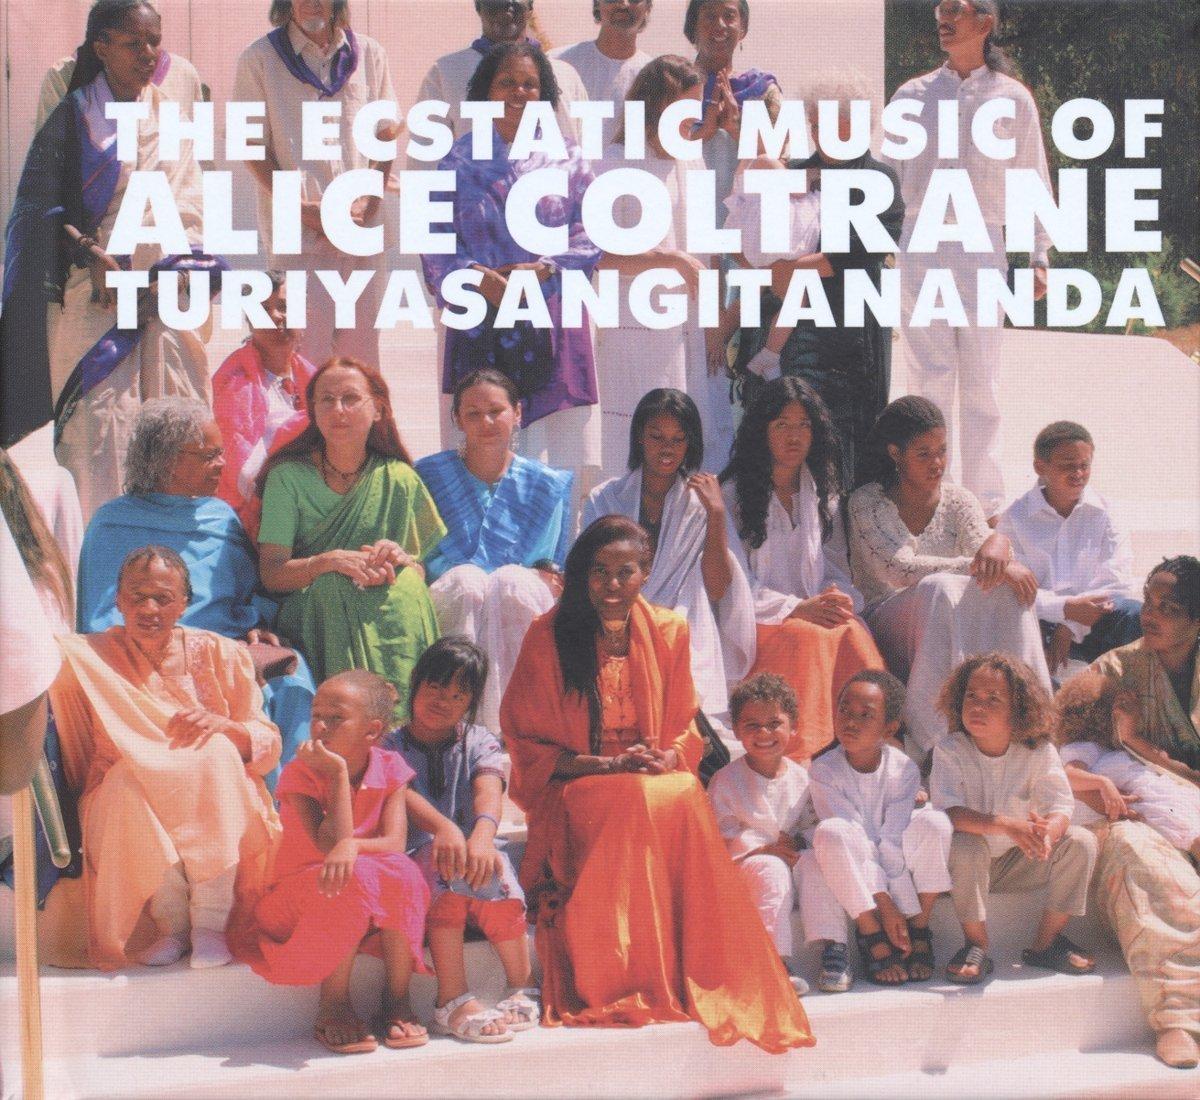 World Spirituality Classics 1: The Ecstatic Music of Turiya Alice Coltrane by Luaka Bop